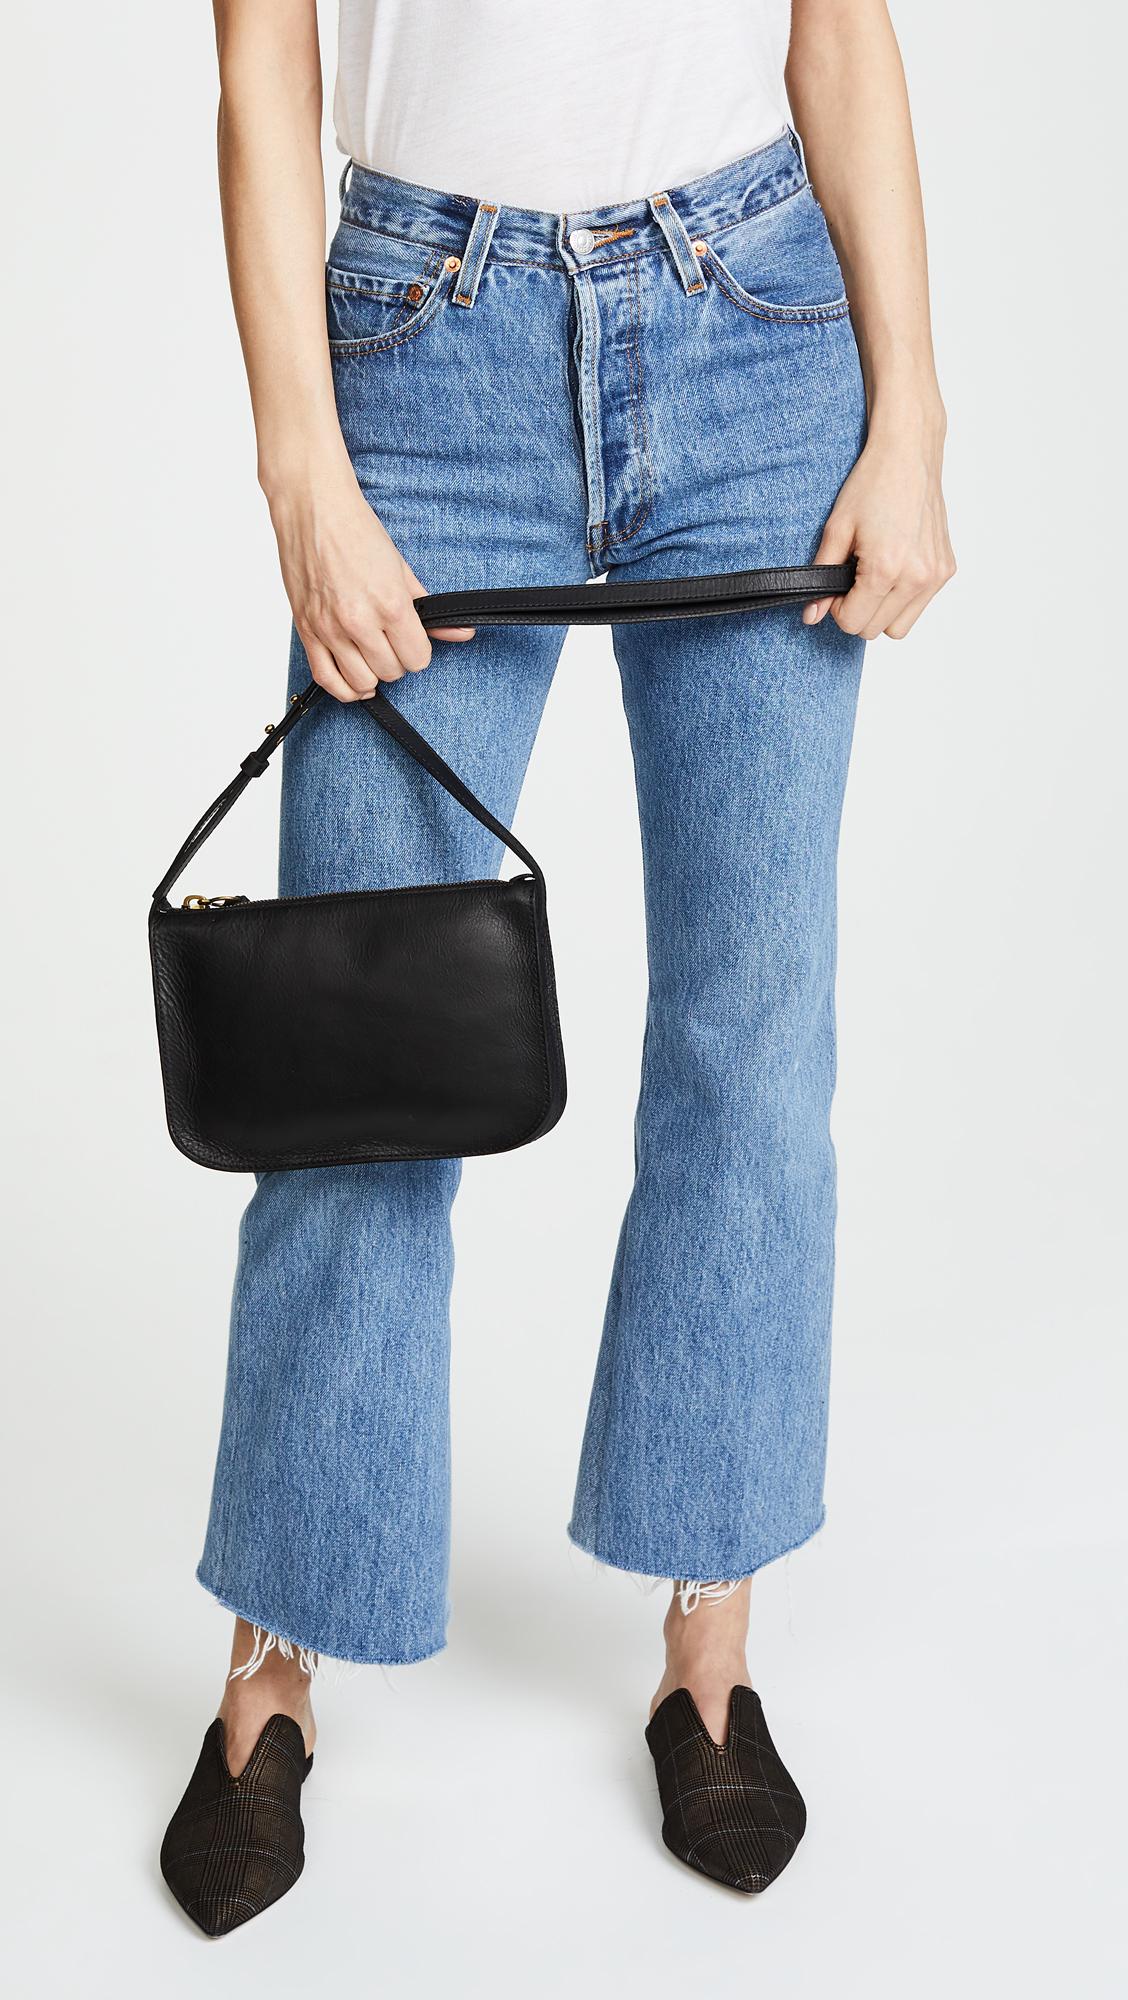 0d35155d70f4 Madewell Simple Pouch Cross Body Bag